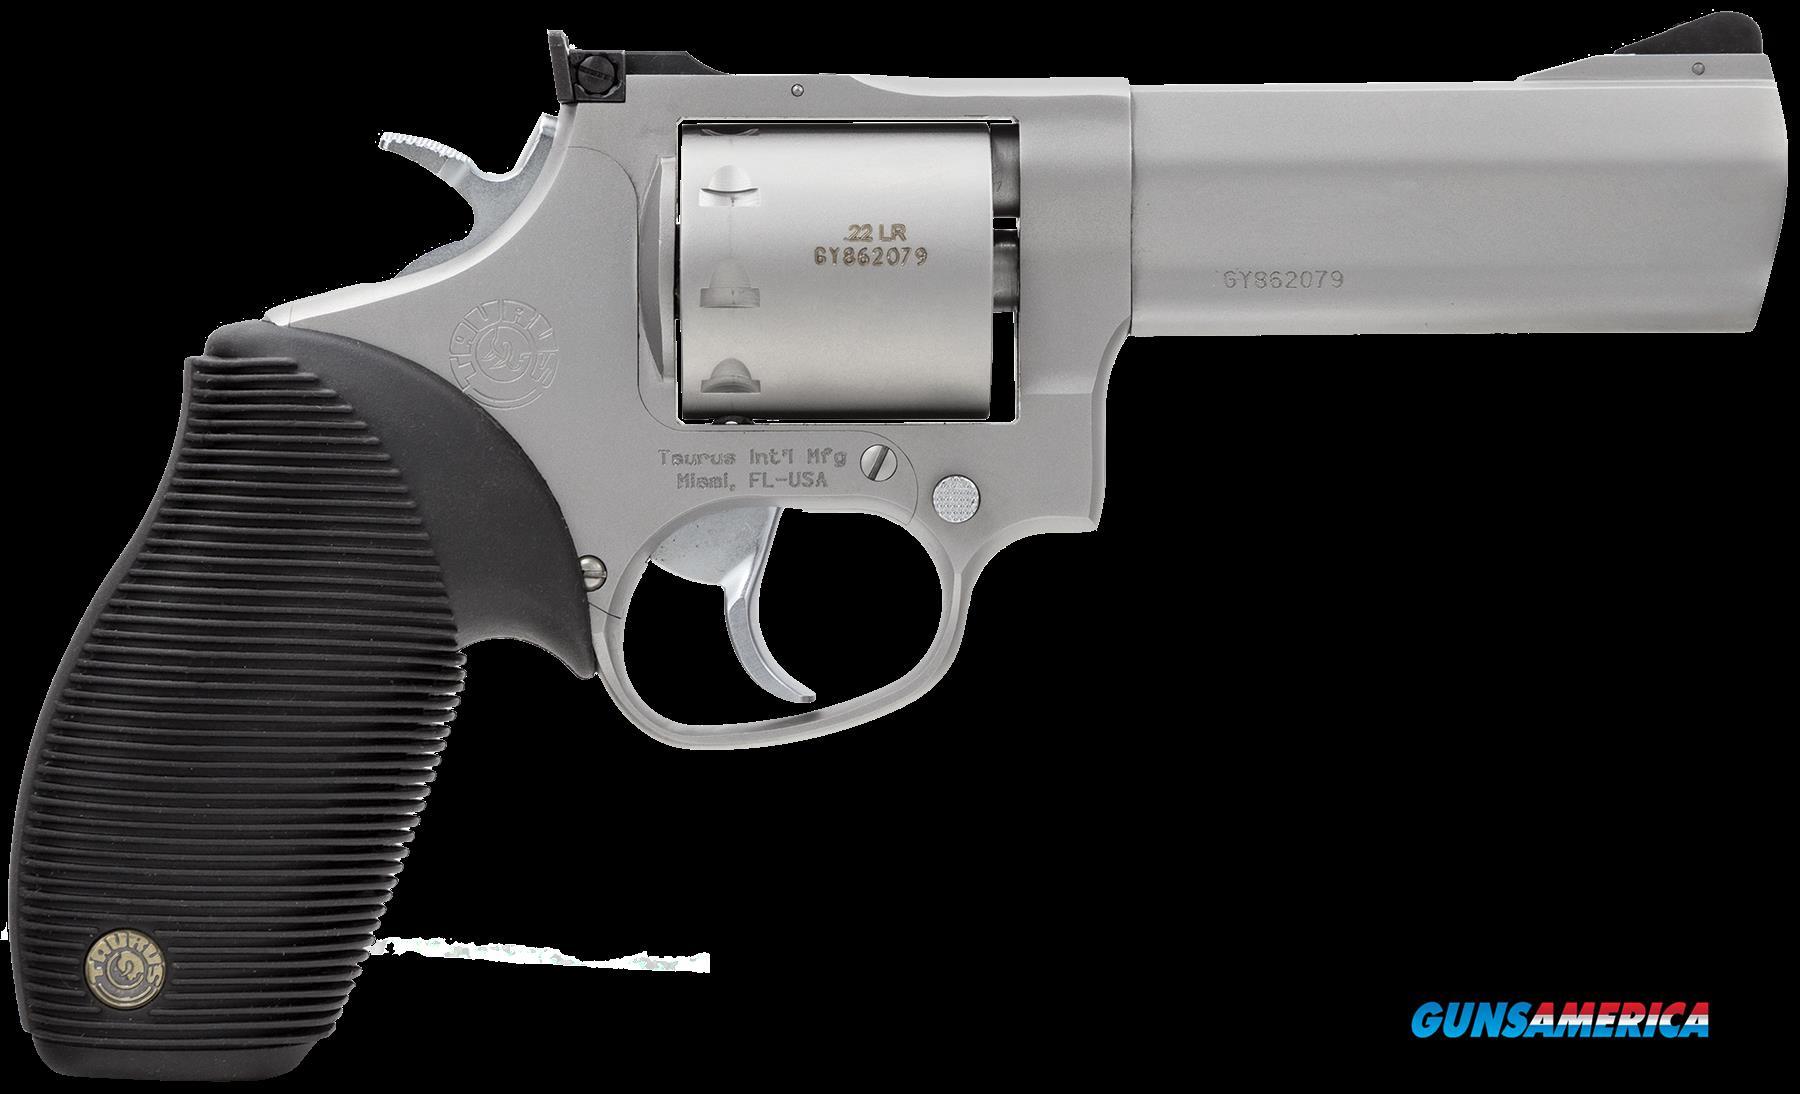 Taurus 992, Tau 2992049       992   22lr-22mg   4in         Ss  Guns > Pistols > 1911 Pistol Copies (non-Colt)